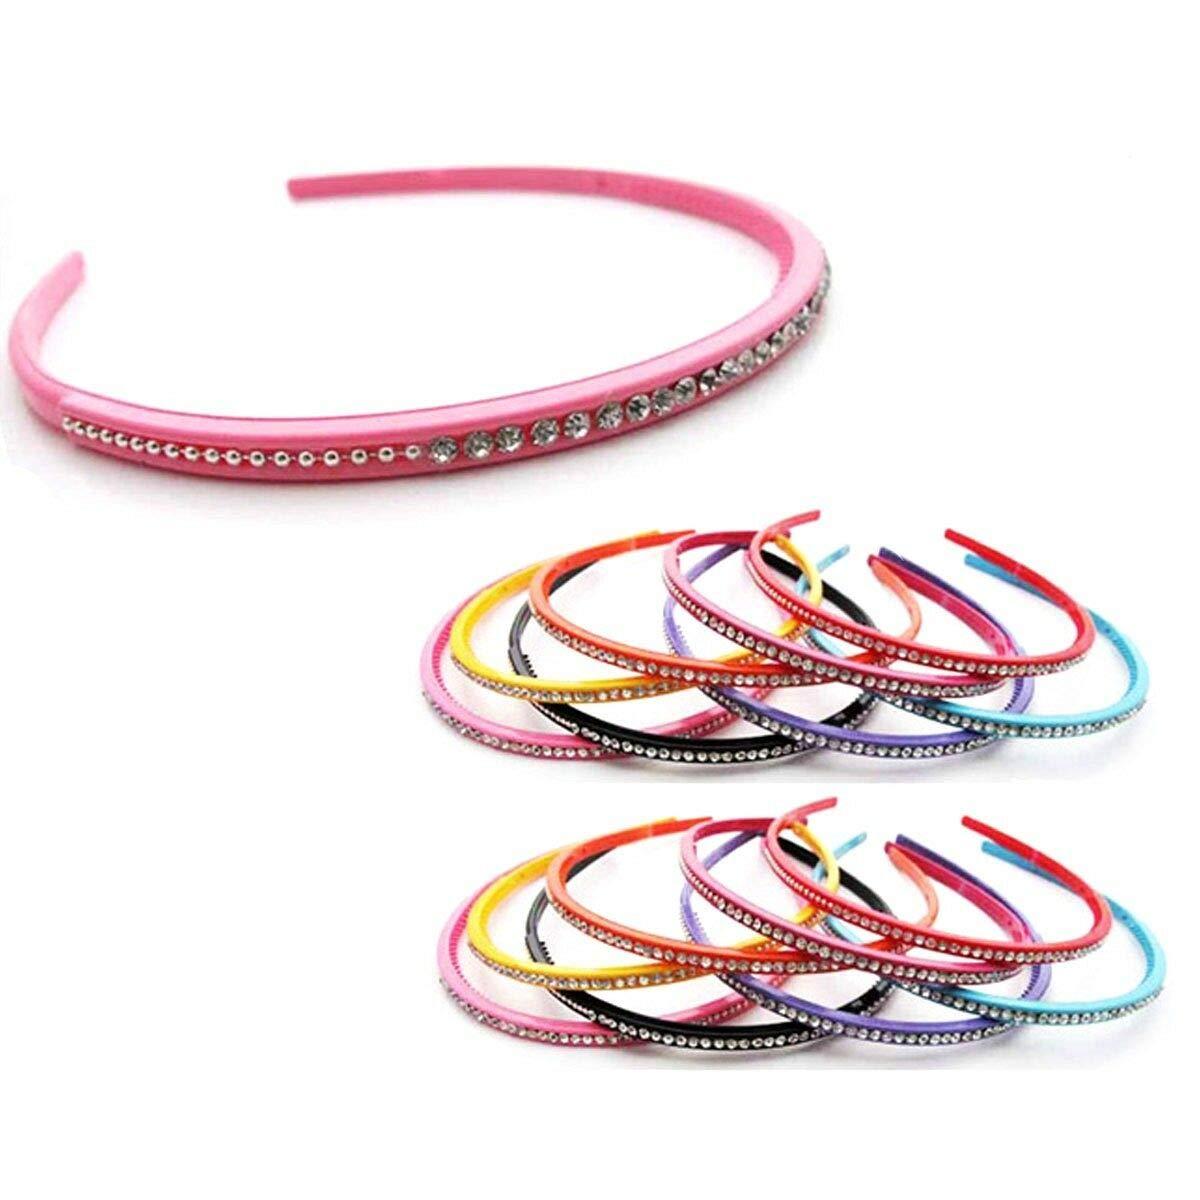 12pcs Rhinestone Crystal Plastic Headband Skinny Thin Hair Band Hairpin wrap Lot